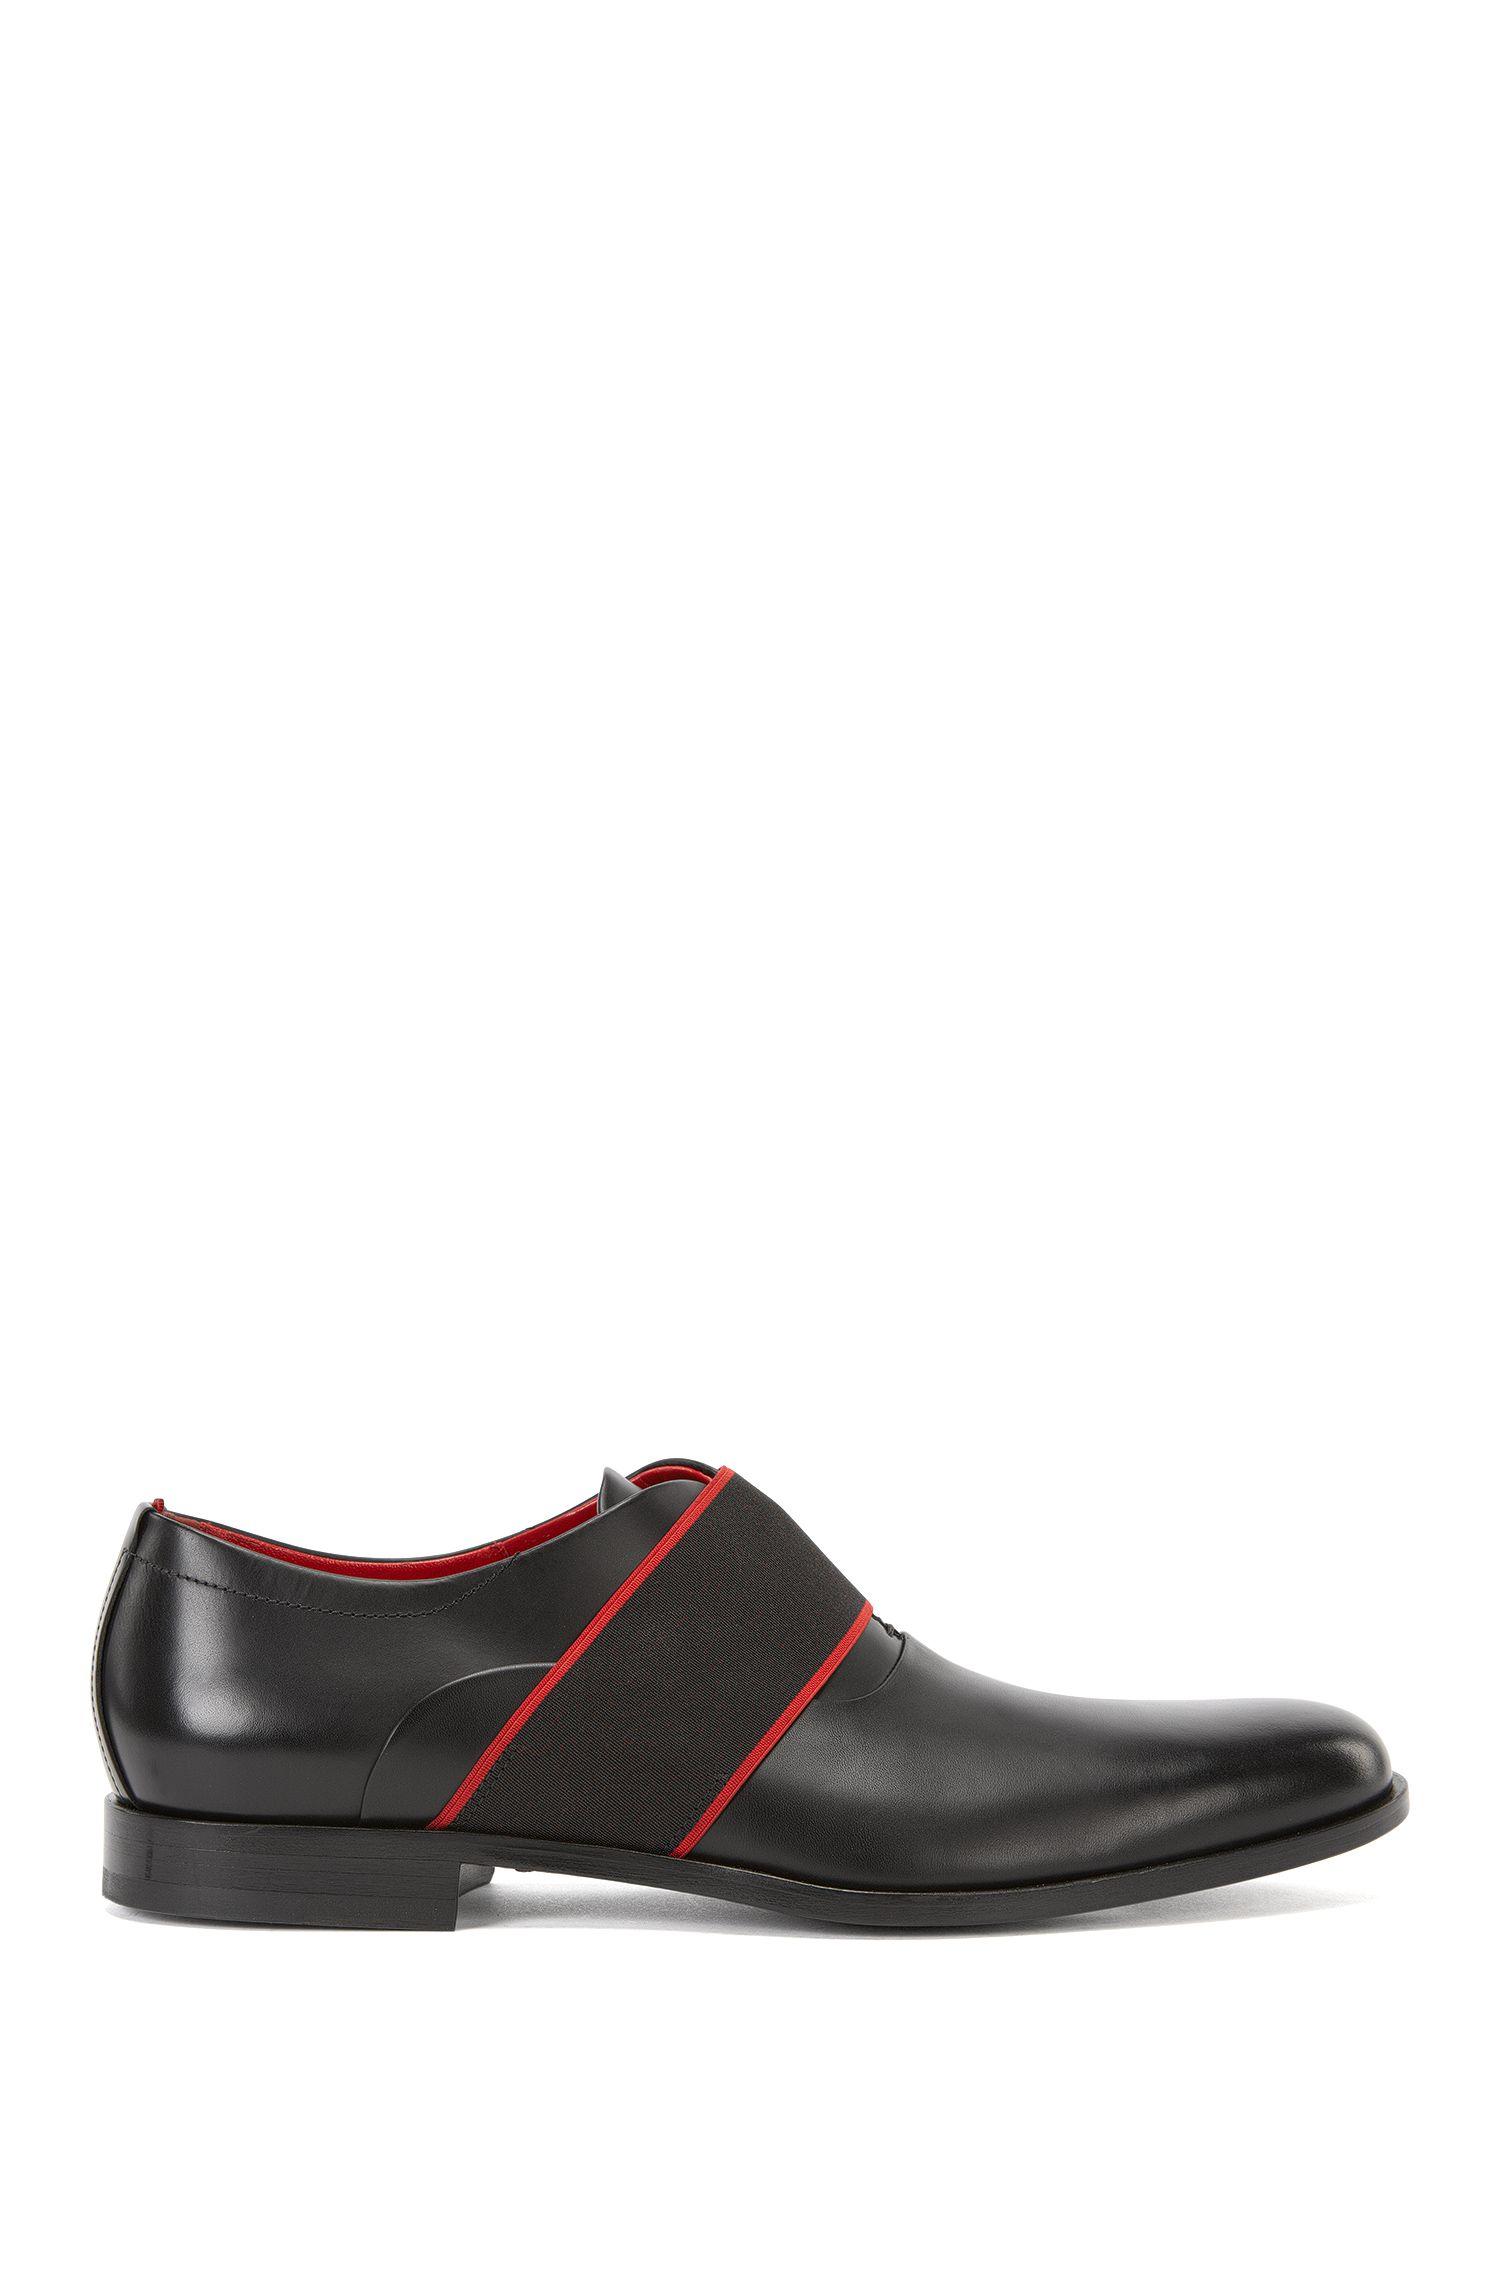 Leather Slip-On Dress Shoes | Sigma Slon Tp